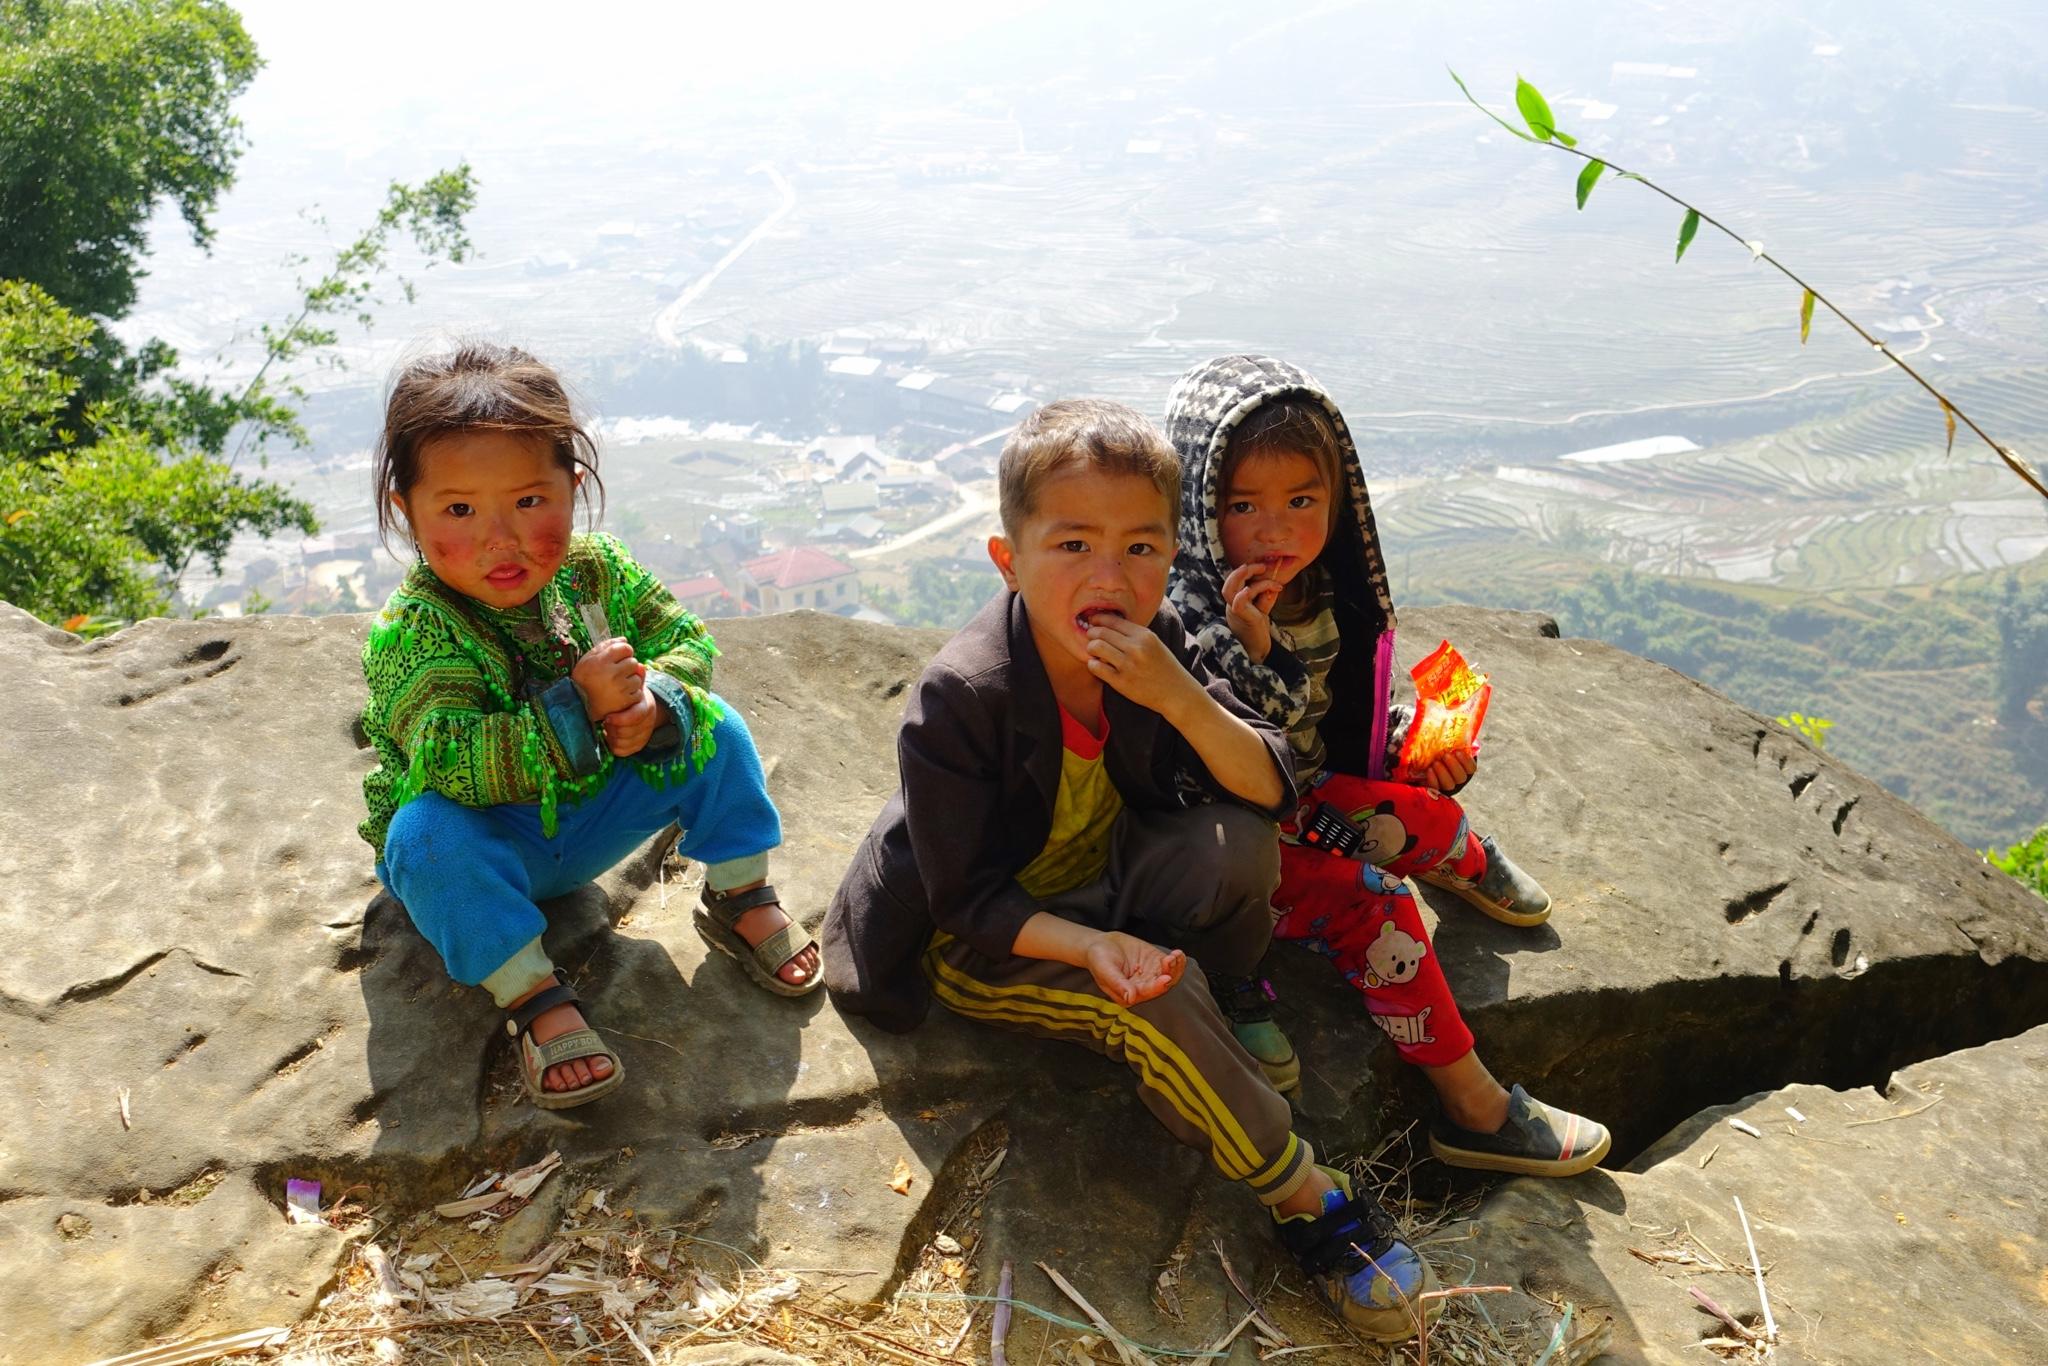 Meeldejääv kodumajutus mägikülas